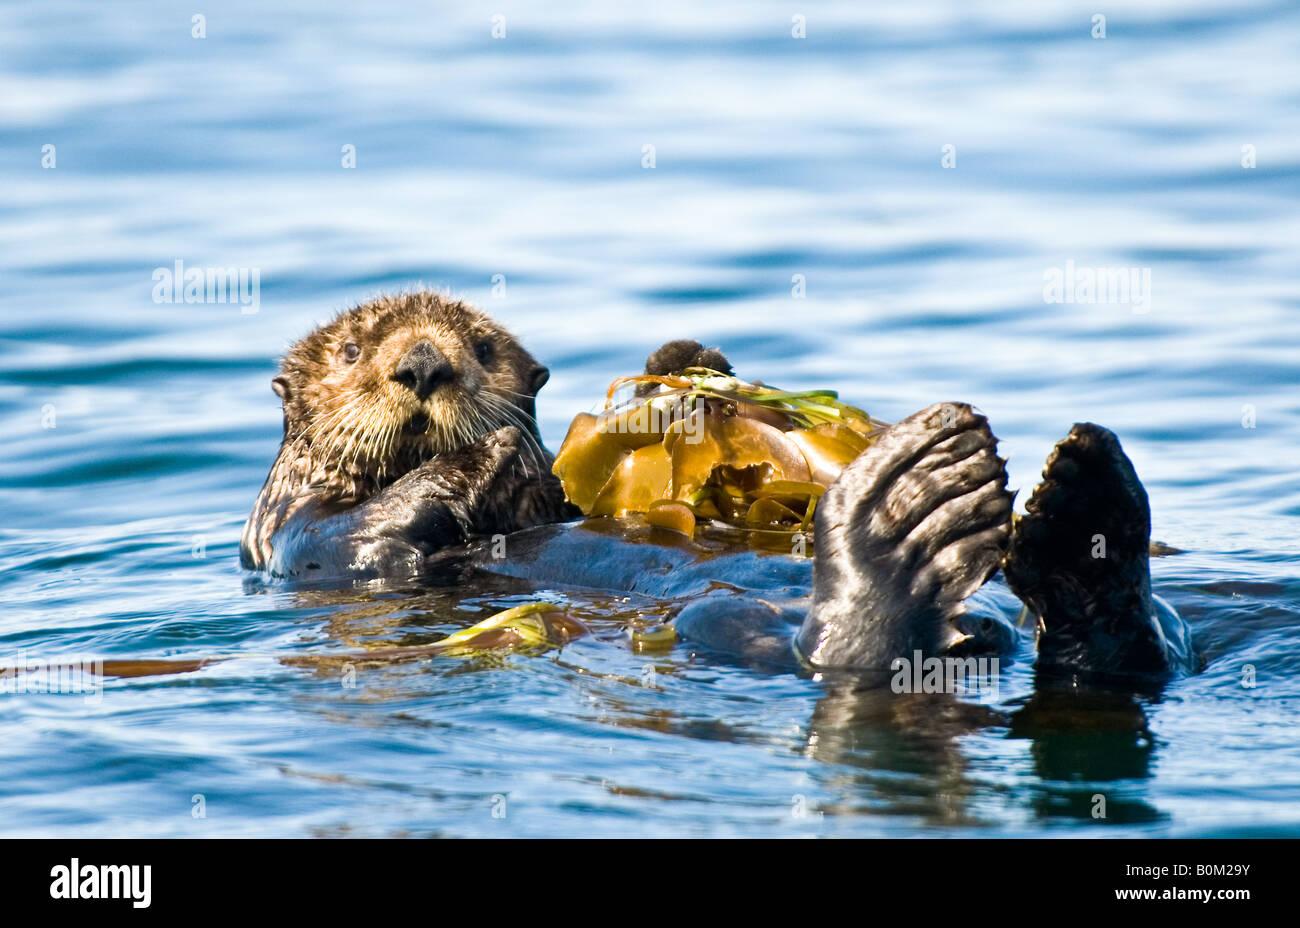 USA Alaska Sea Otter reposant sur lit de varech dans ocean Photo Stock